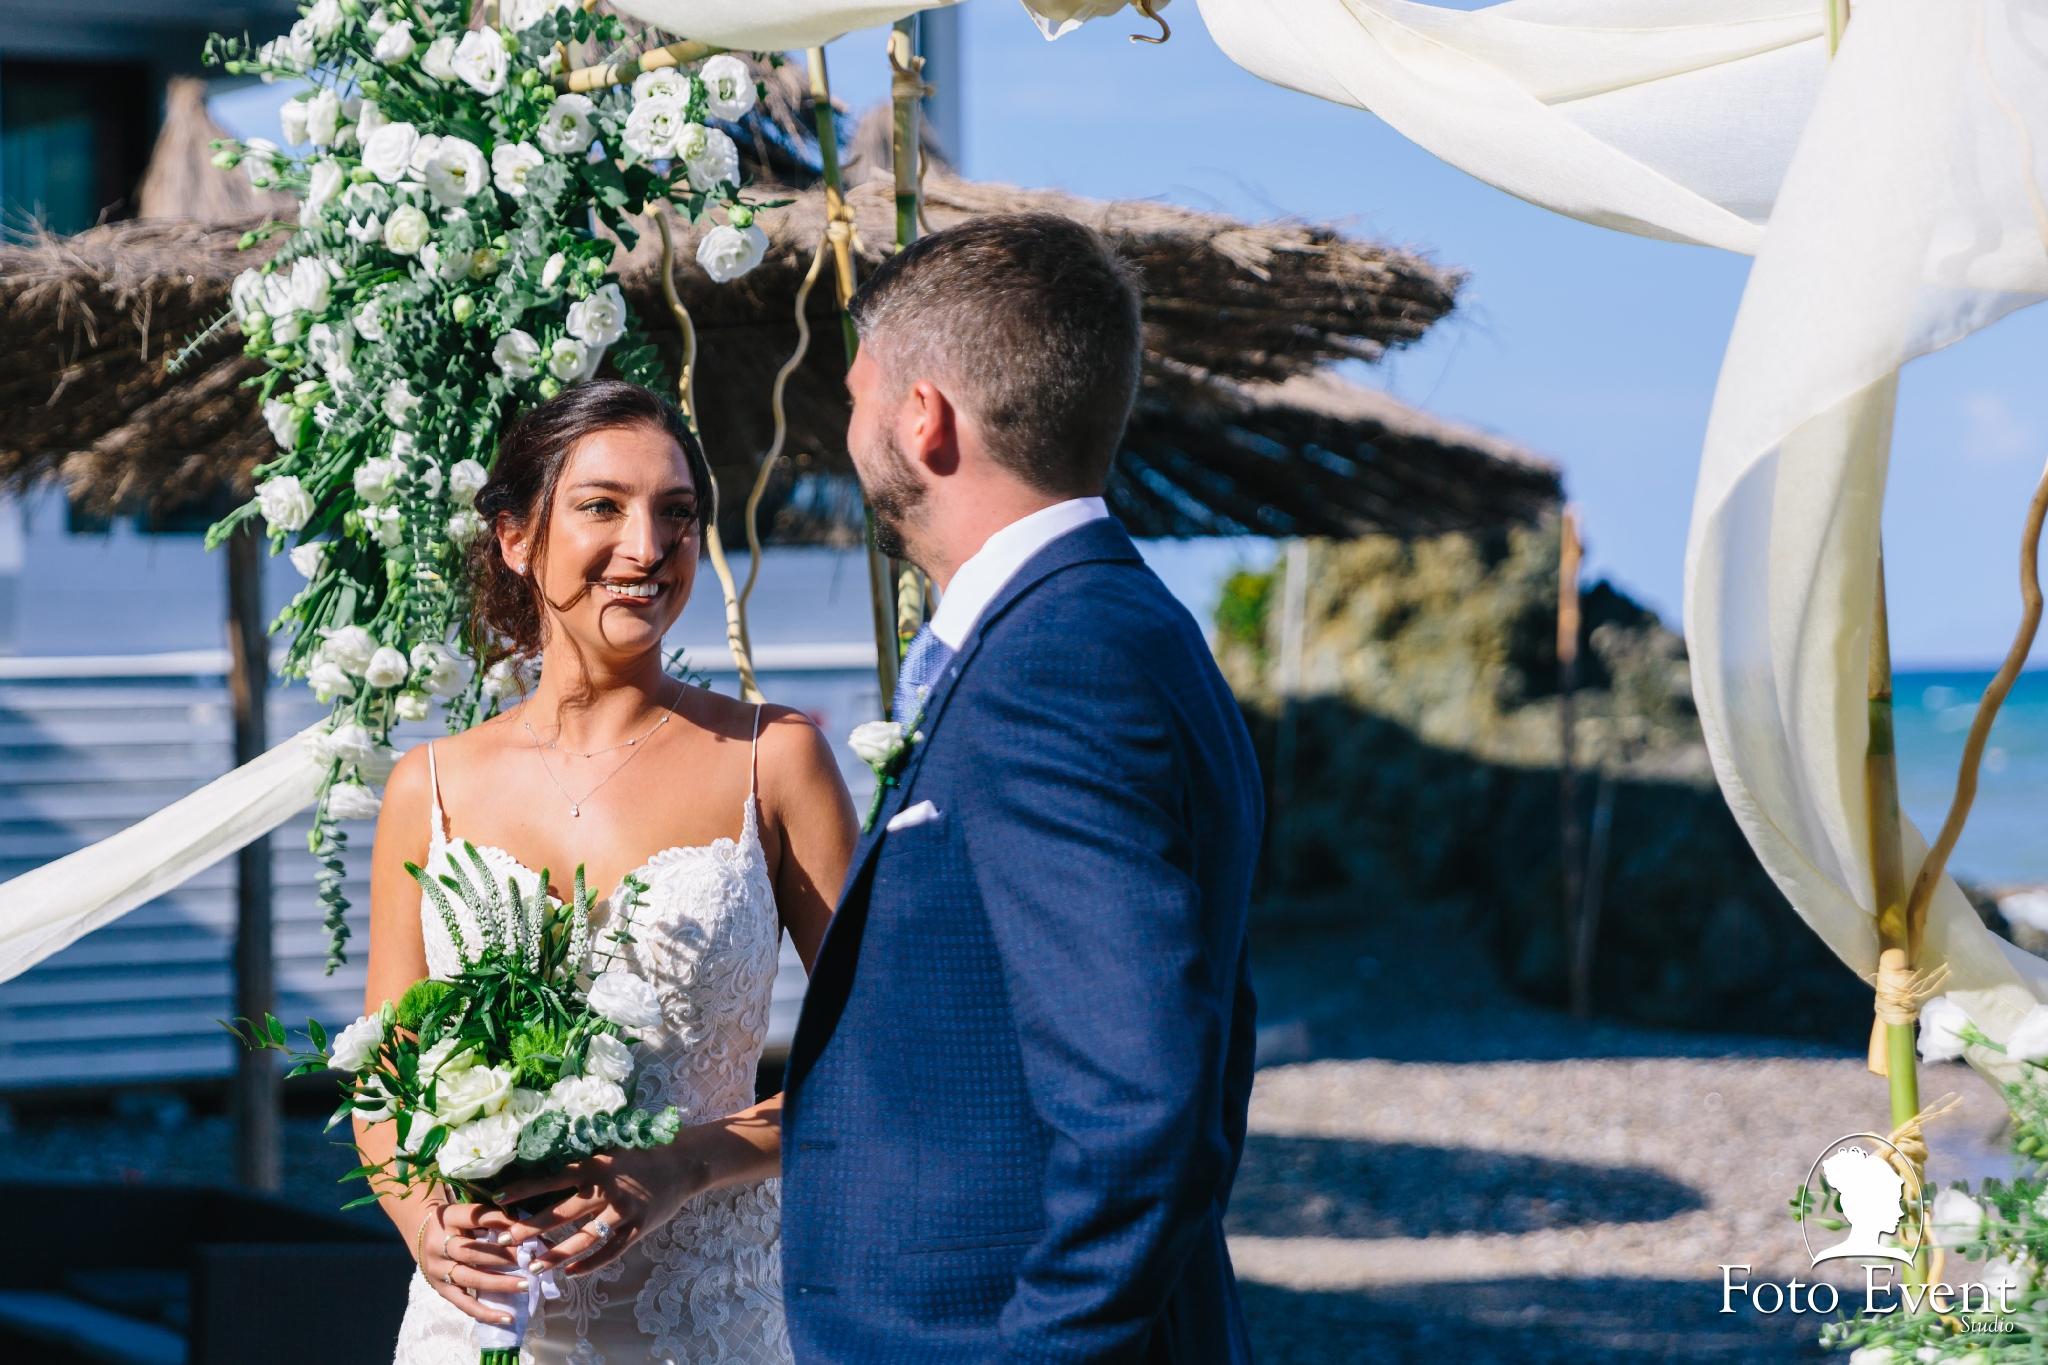 2018-09-25 Matrimonio Jessi e Simon Milligan 5DE 072